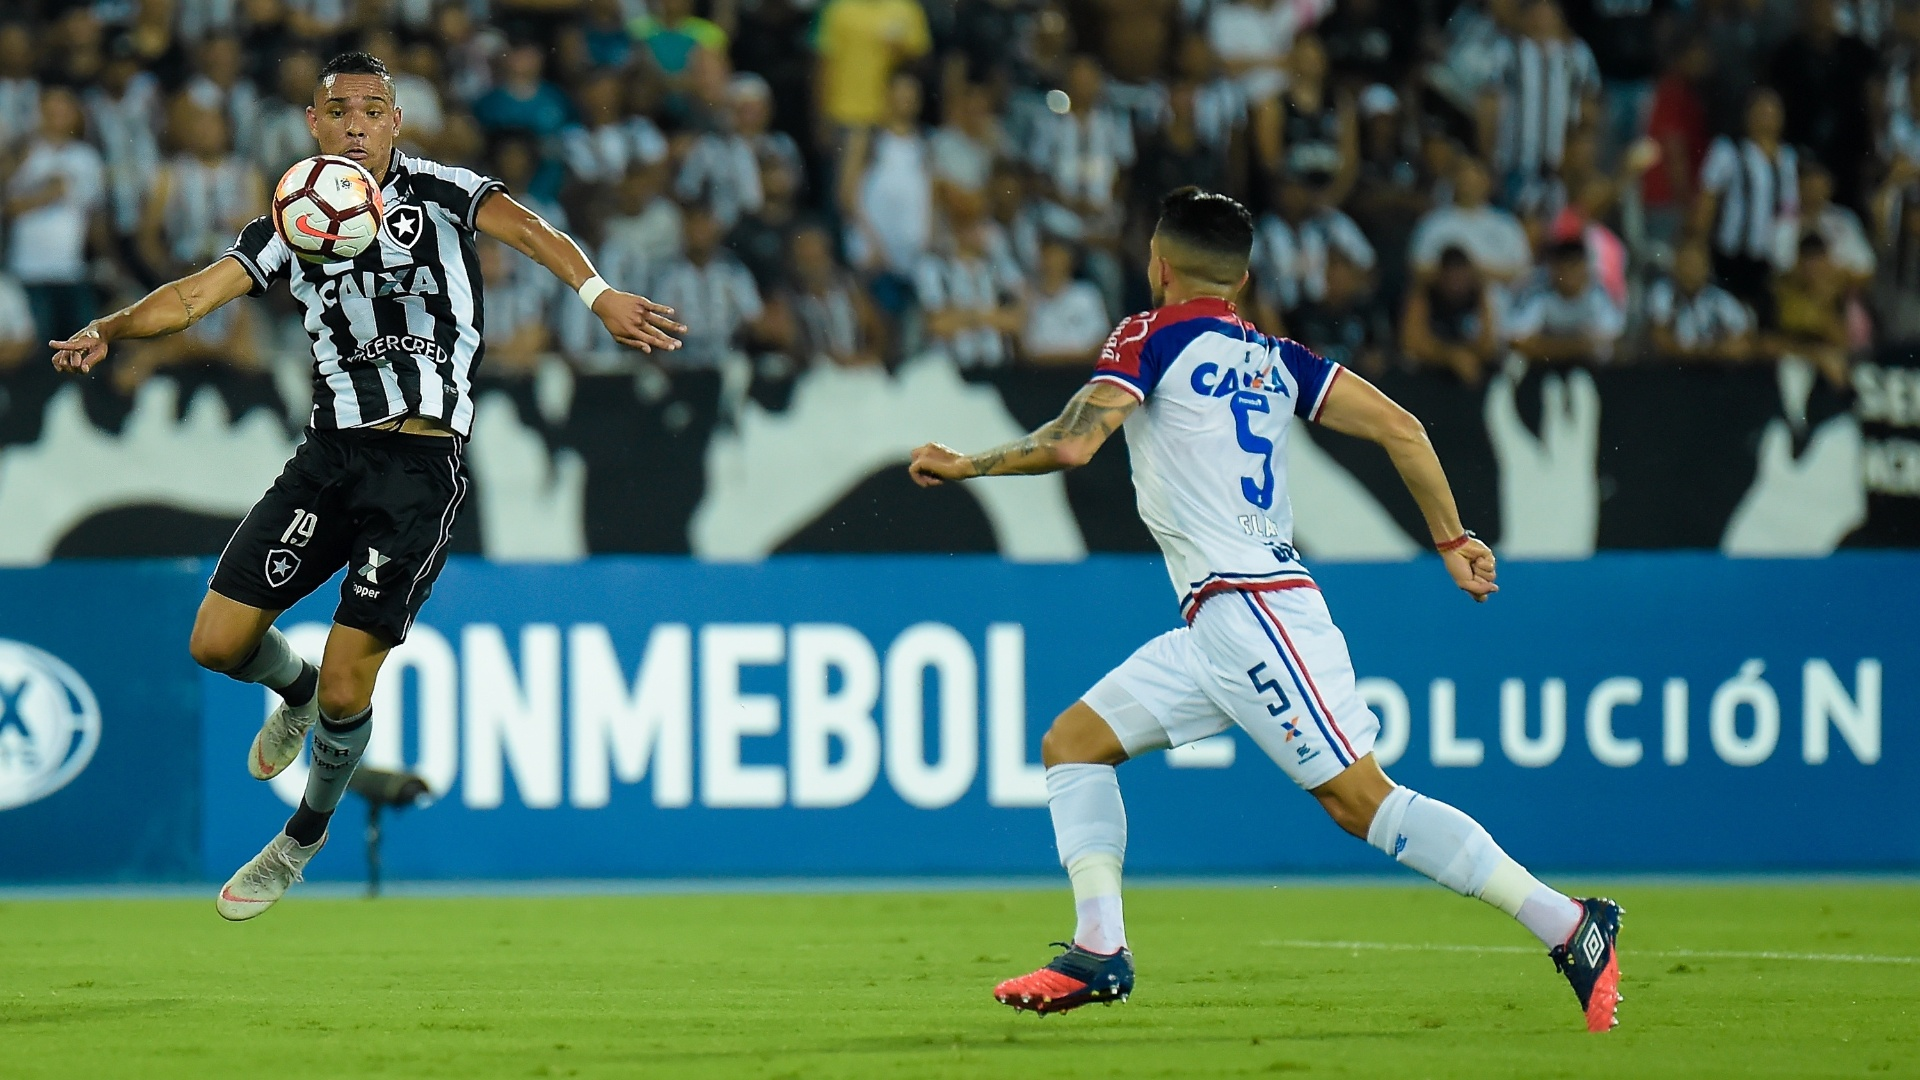 Luiz Fernando, jogador do Botafogo, domina bola durante partida contra o Bahia